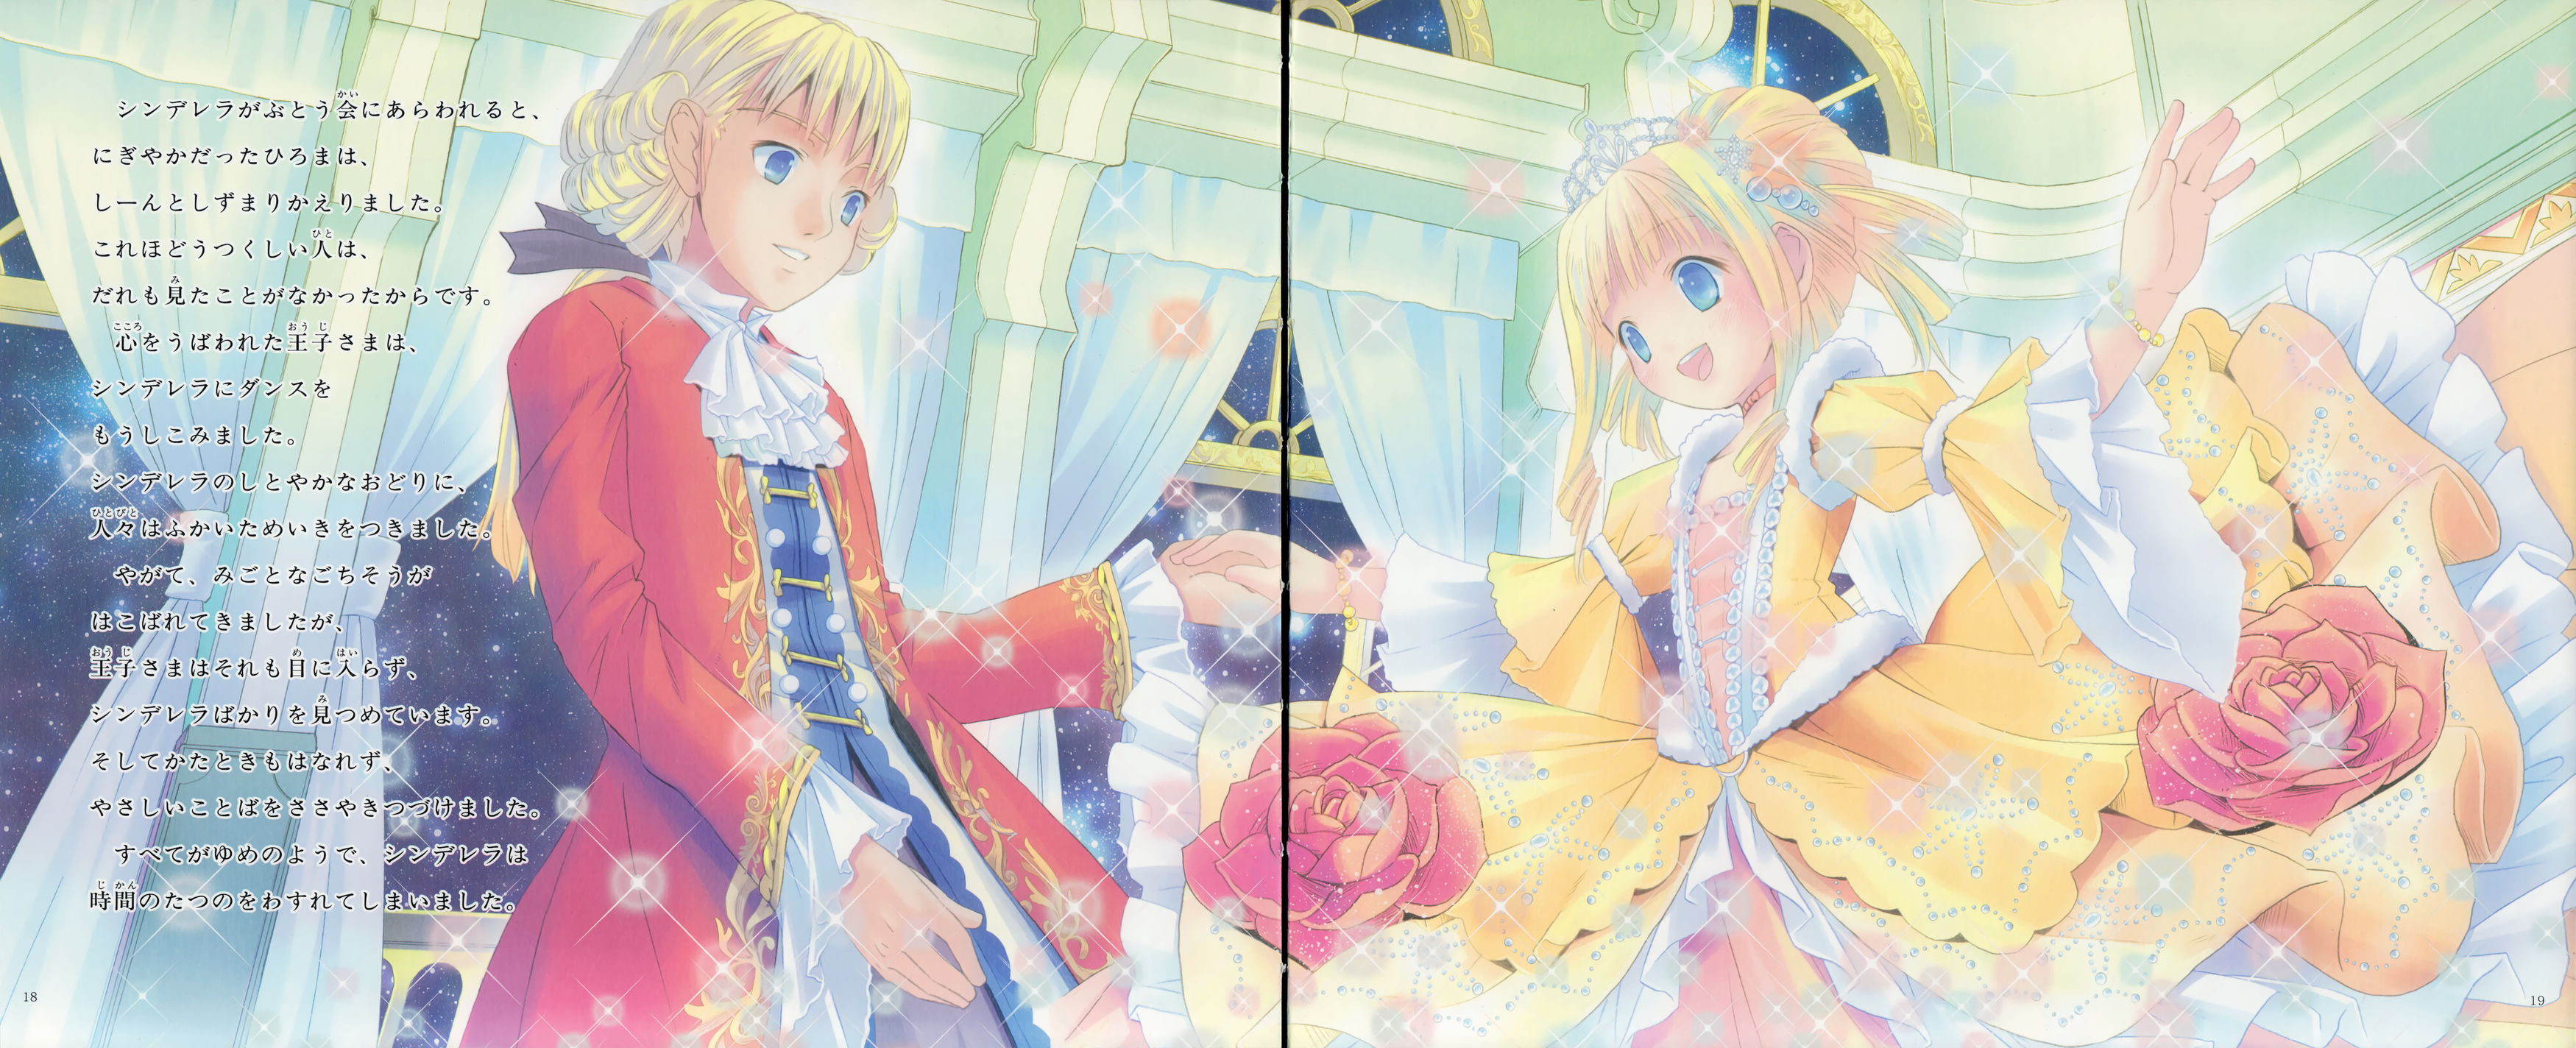 cinderella page 4 of 9 zerochan anime image board